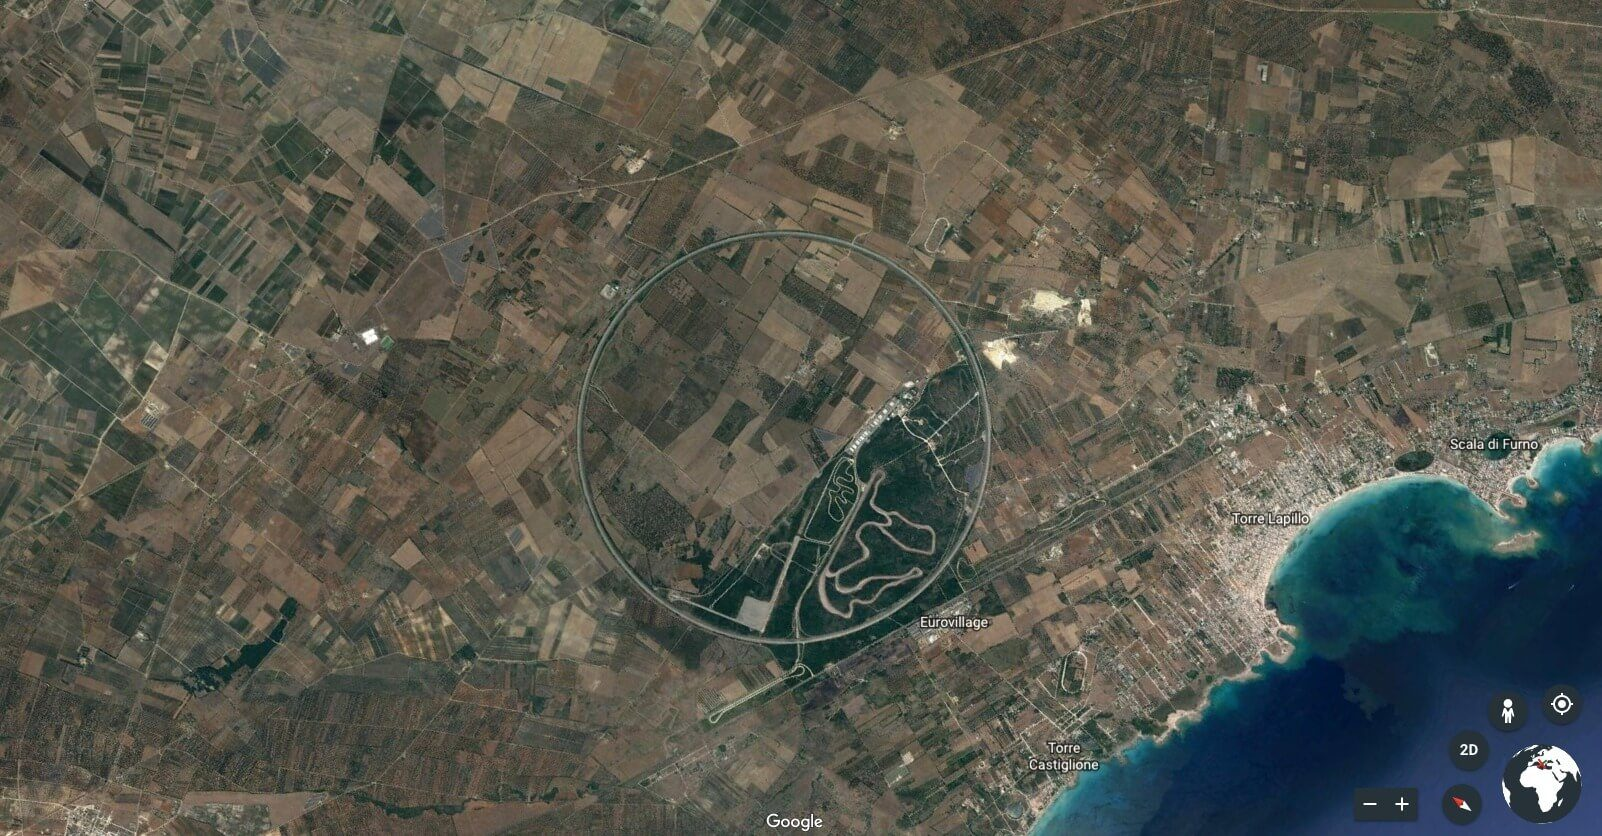 9-Long racetrack